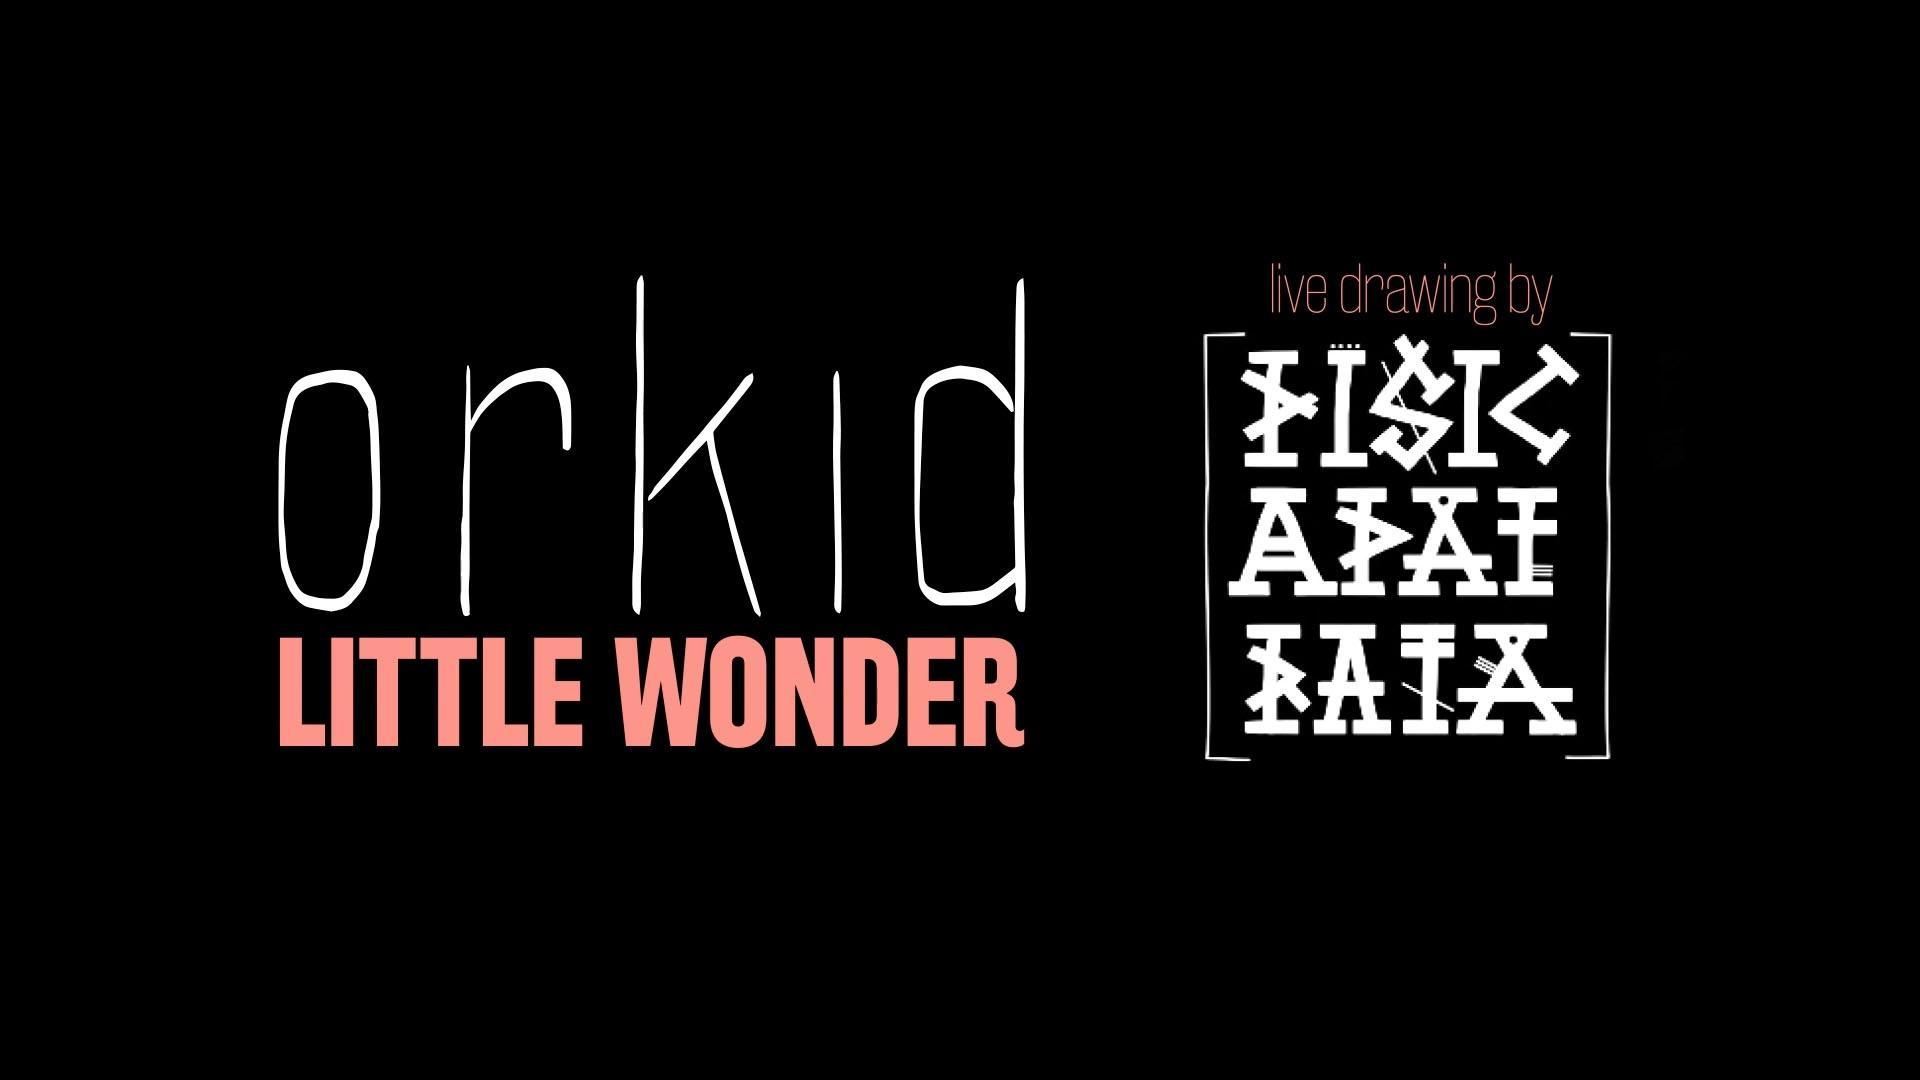 Orkid lansează Little Wonder